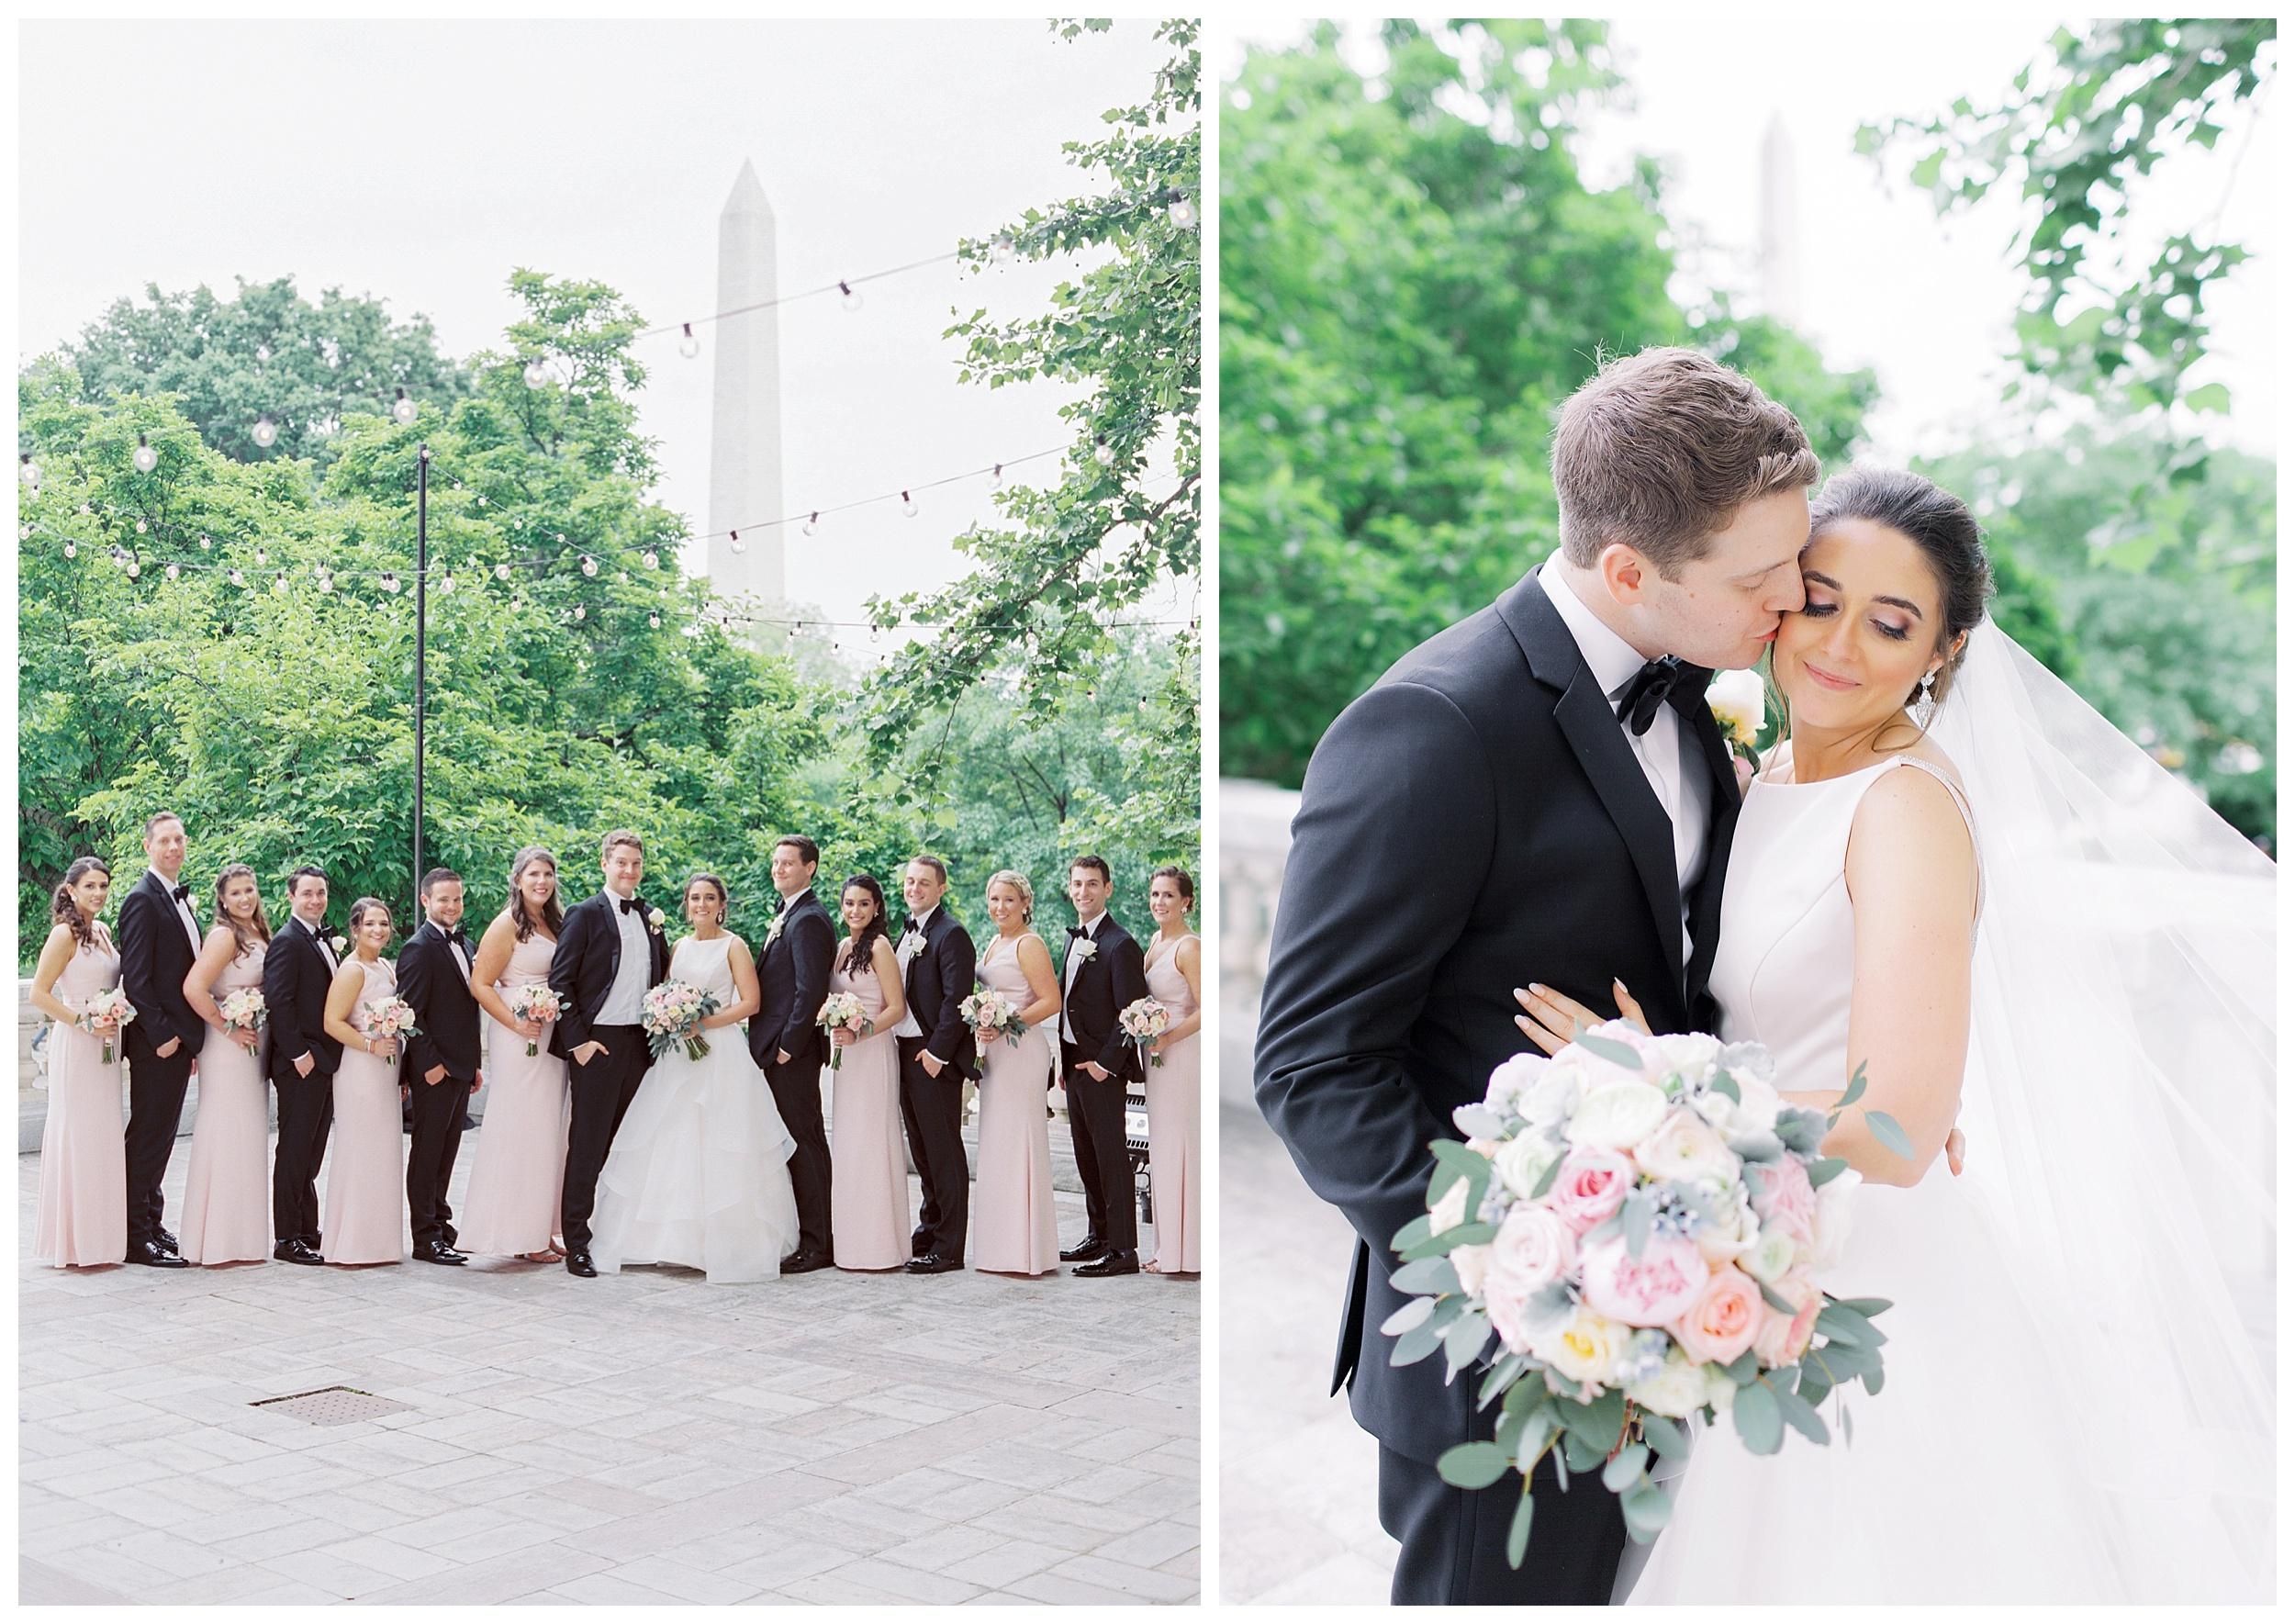 DAR Constitution Hall Wedding Wedding | Daughters of the American Revolution Wedding | District of Columbia Film Wedding Photographer Kir Tuben_0084.jpg